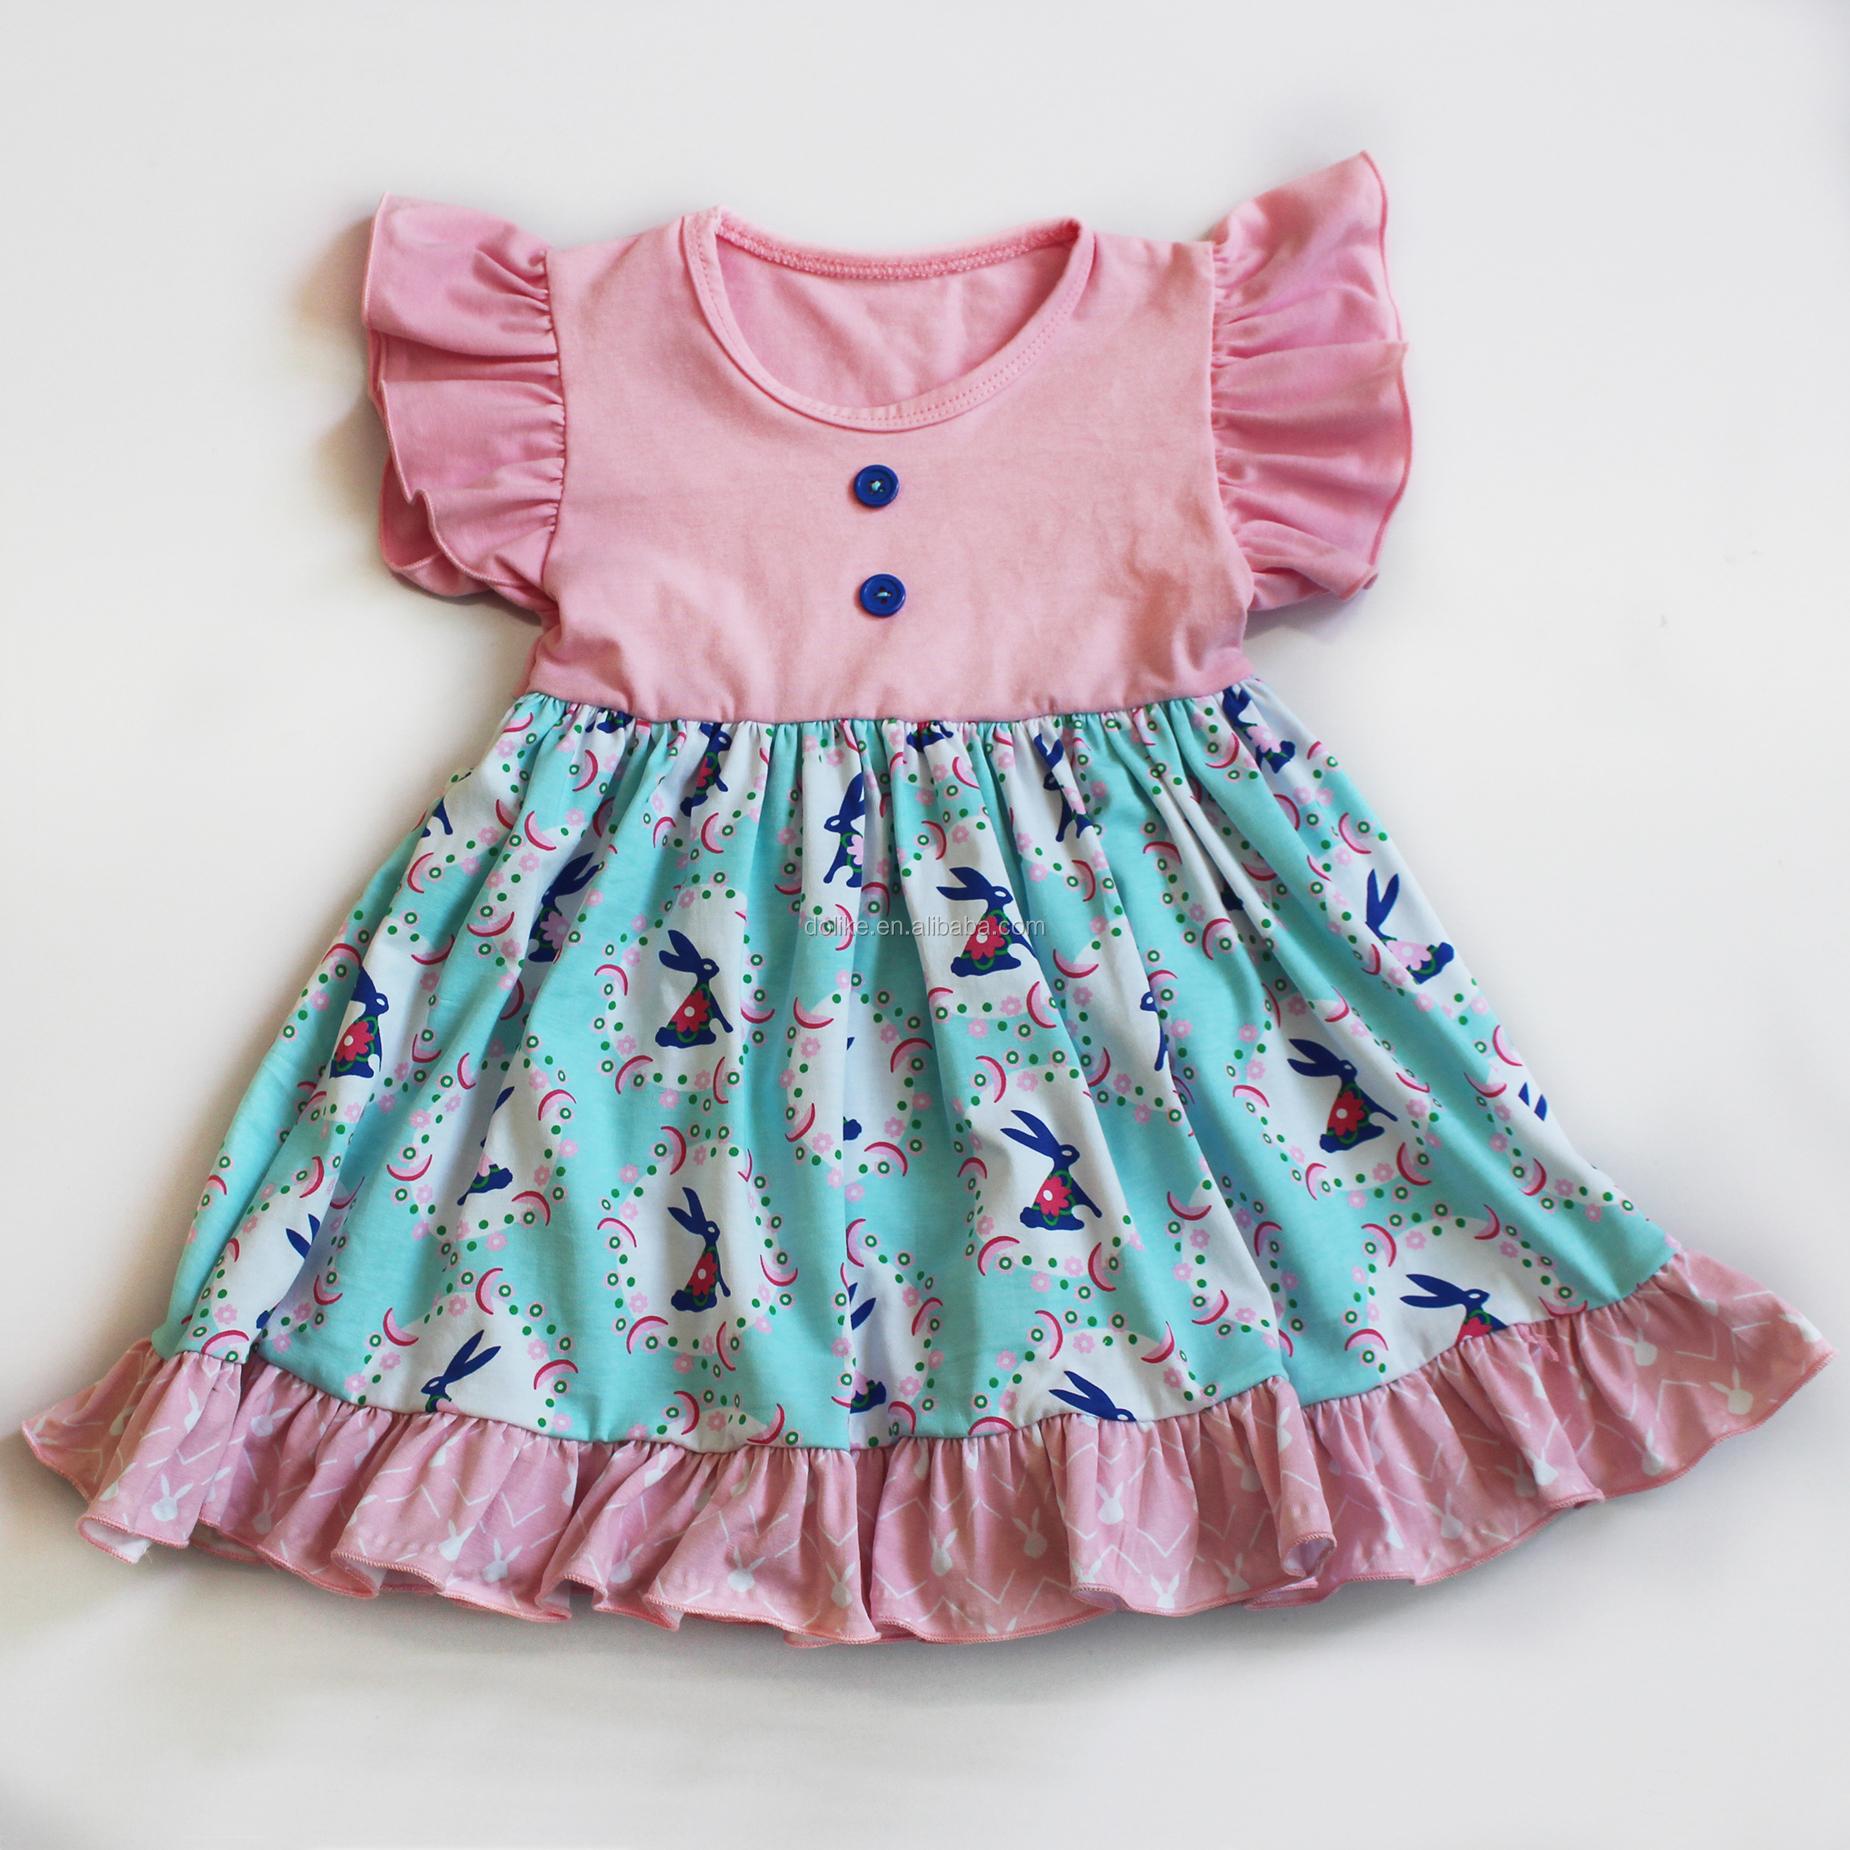 Unusual Www.baby Party Dress.com Gallery - Wedding Ideas - memiocall.com